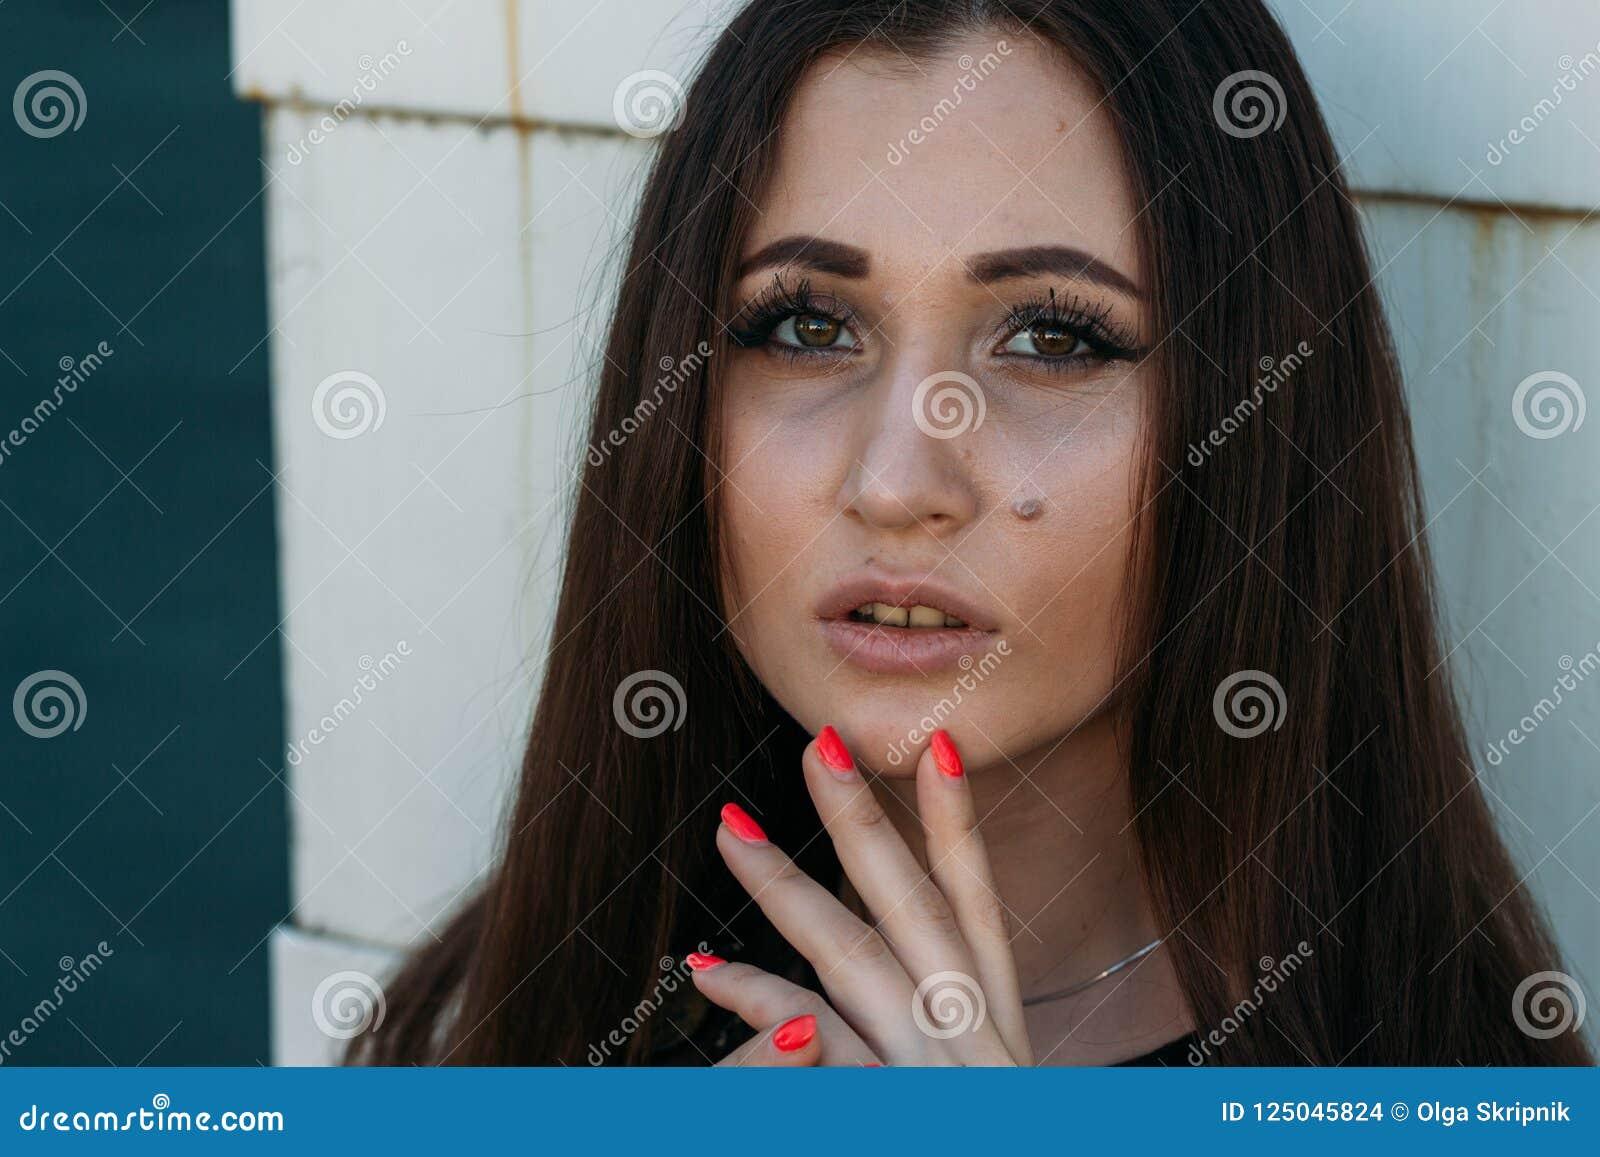 Emotional portrait of Fashion stylish portrait of pretty young woman. city portrait. sad girl. brunette in a black dress. expectat